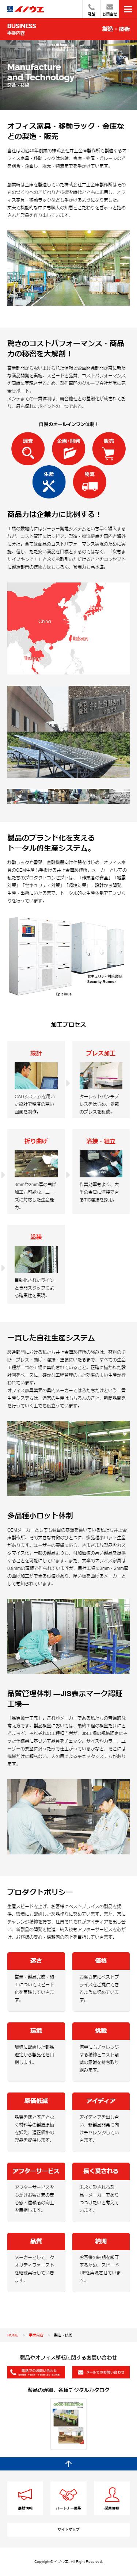 福井市 井上金庫販売株式会社様 ホームページ制作4